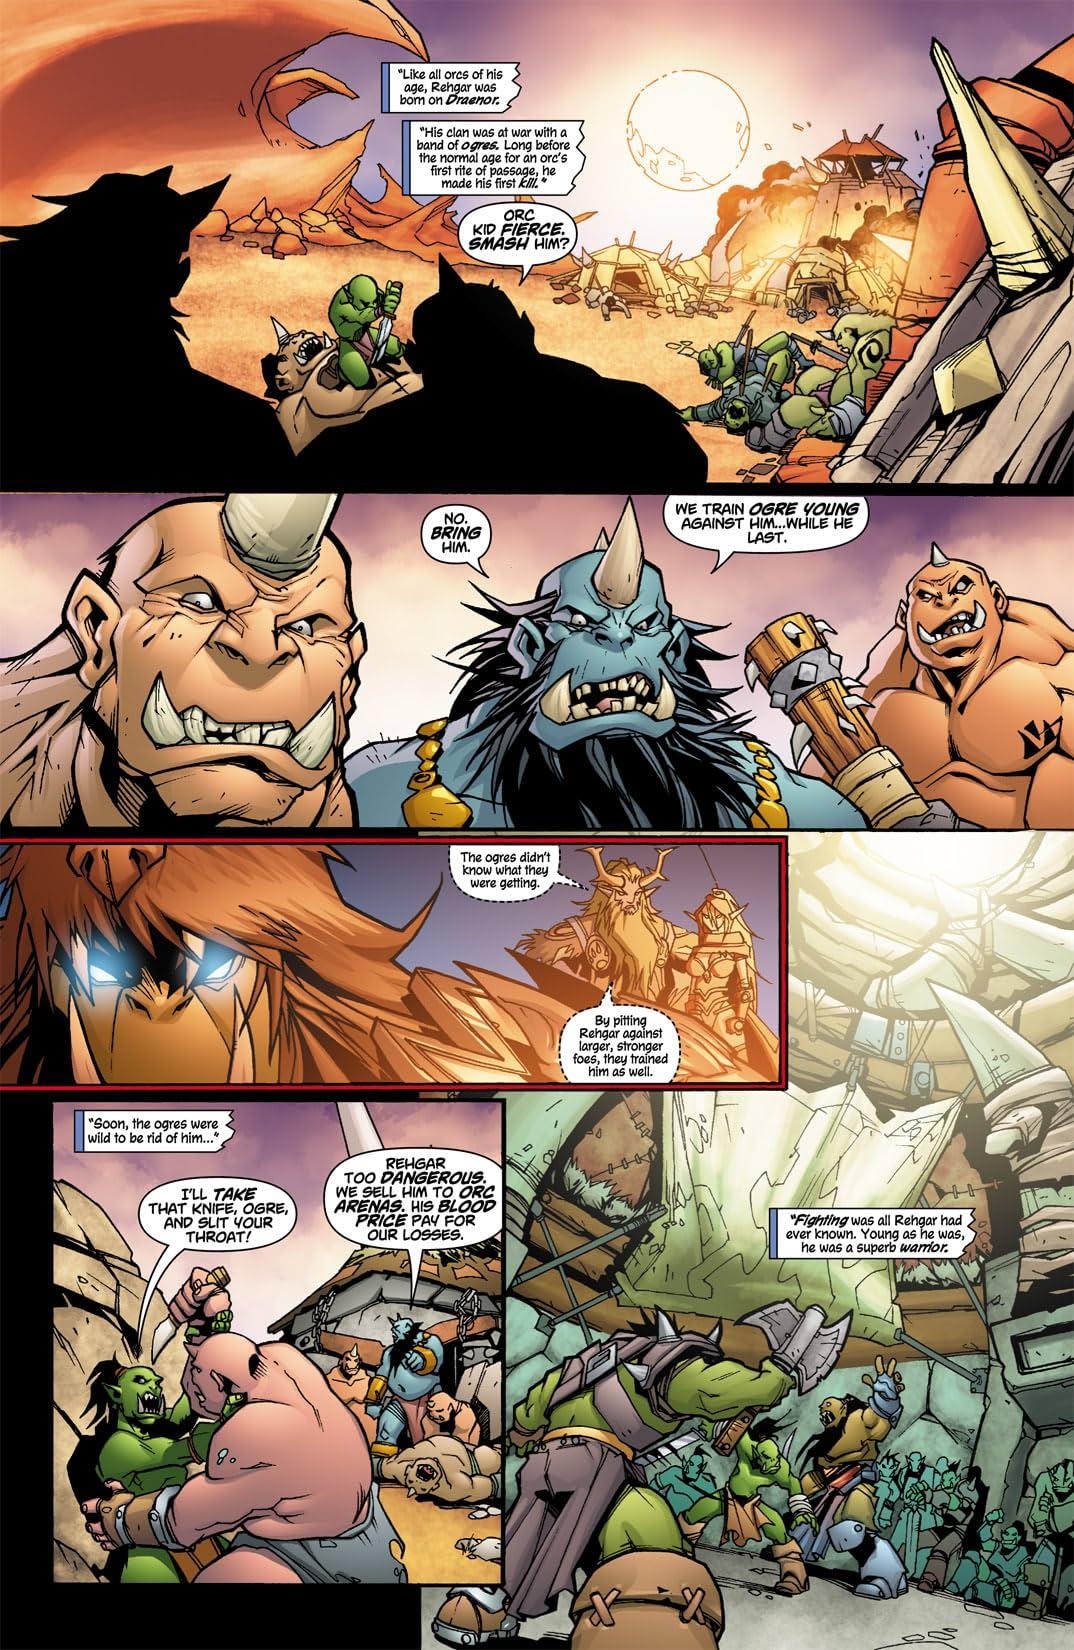 World of Warcraft #0